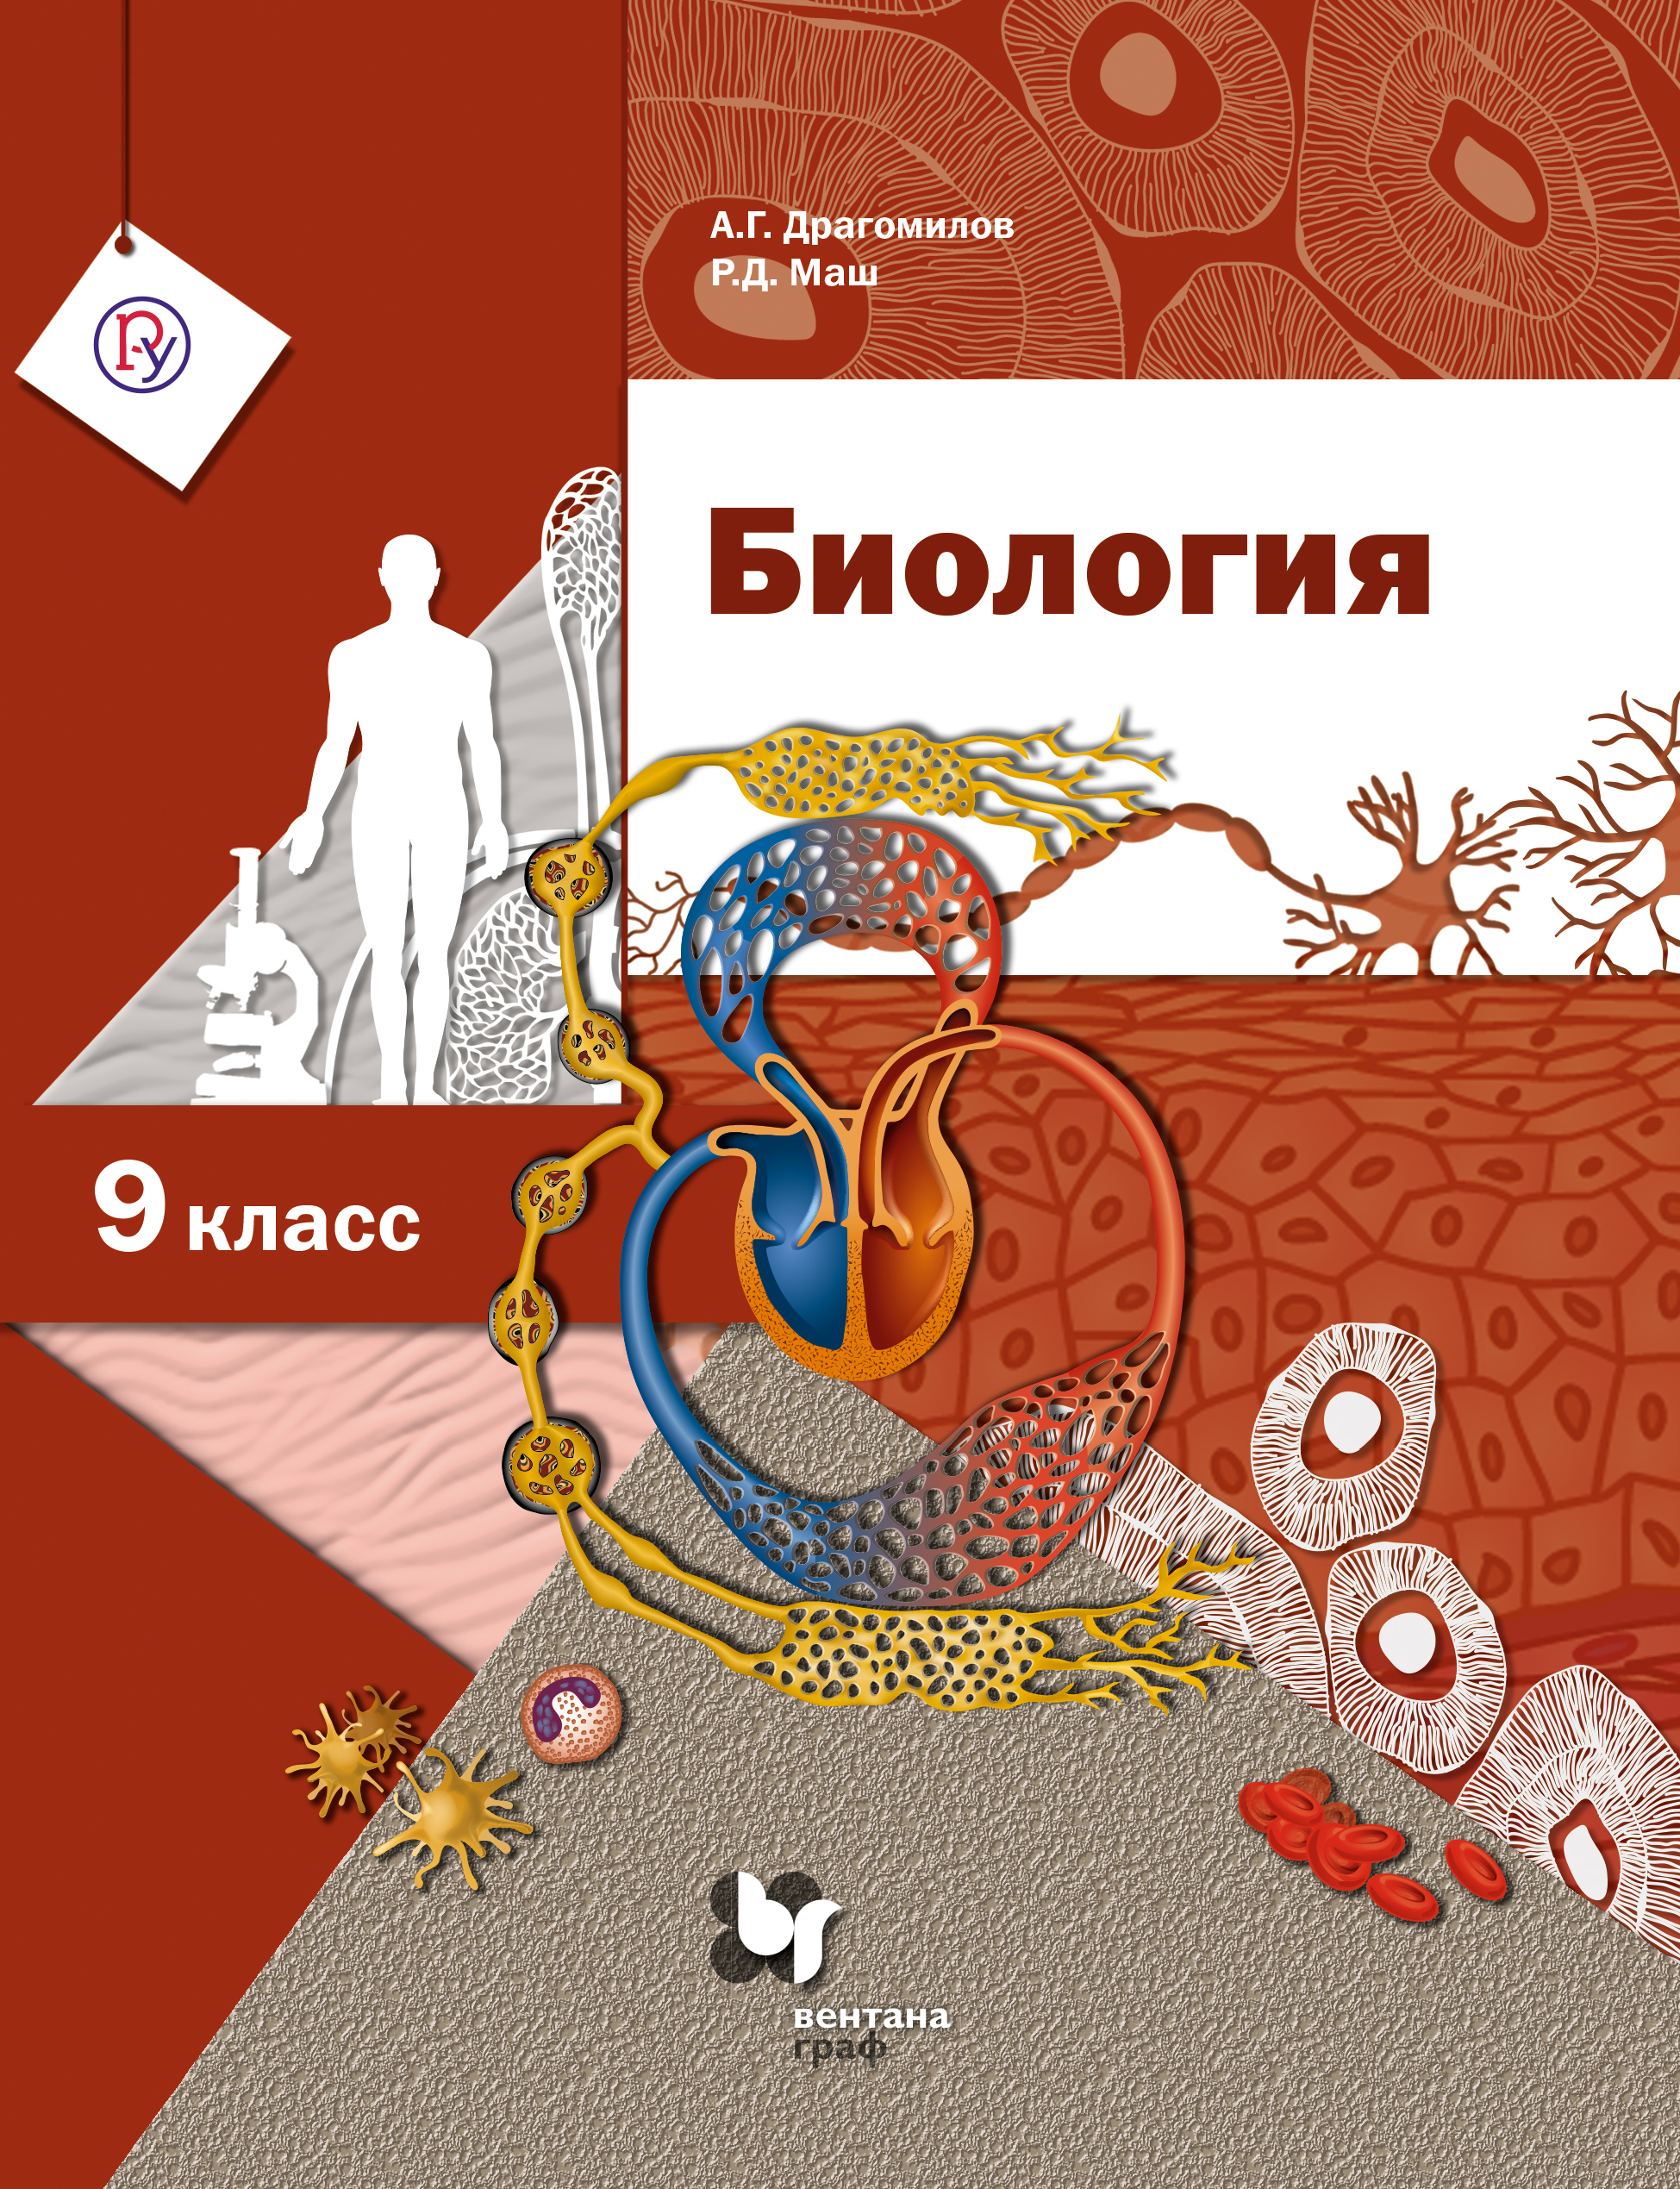 Биология. 9 класс. Учебник ( Маш Р.Д.  )